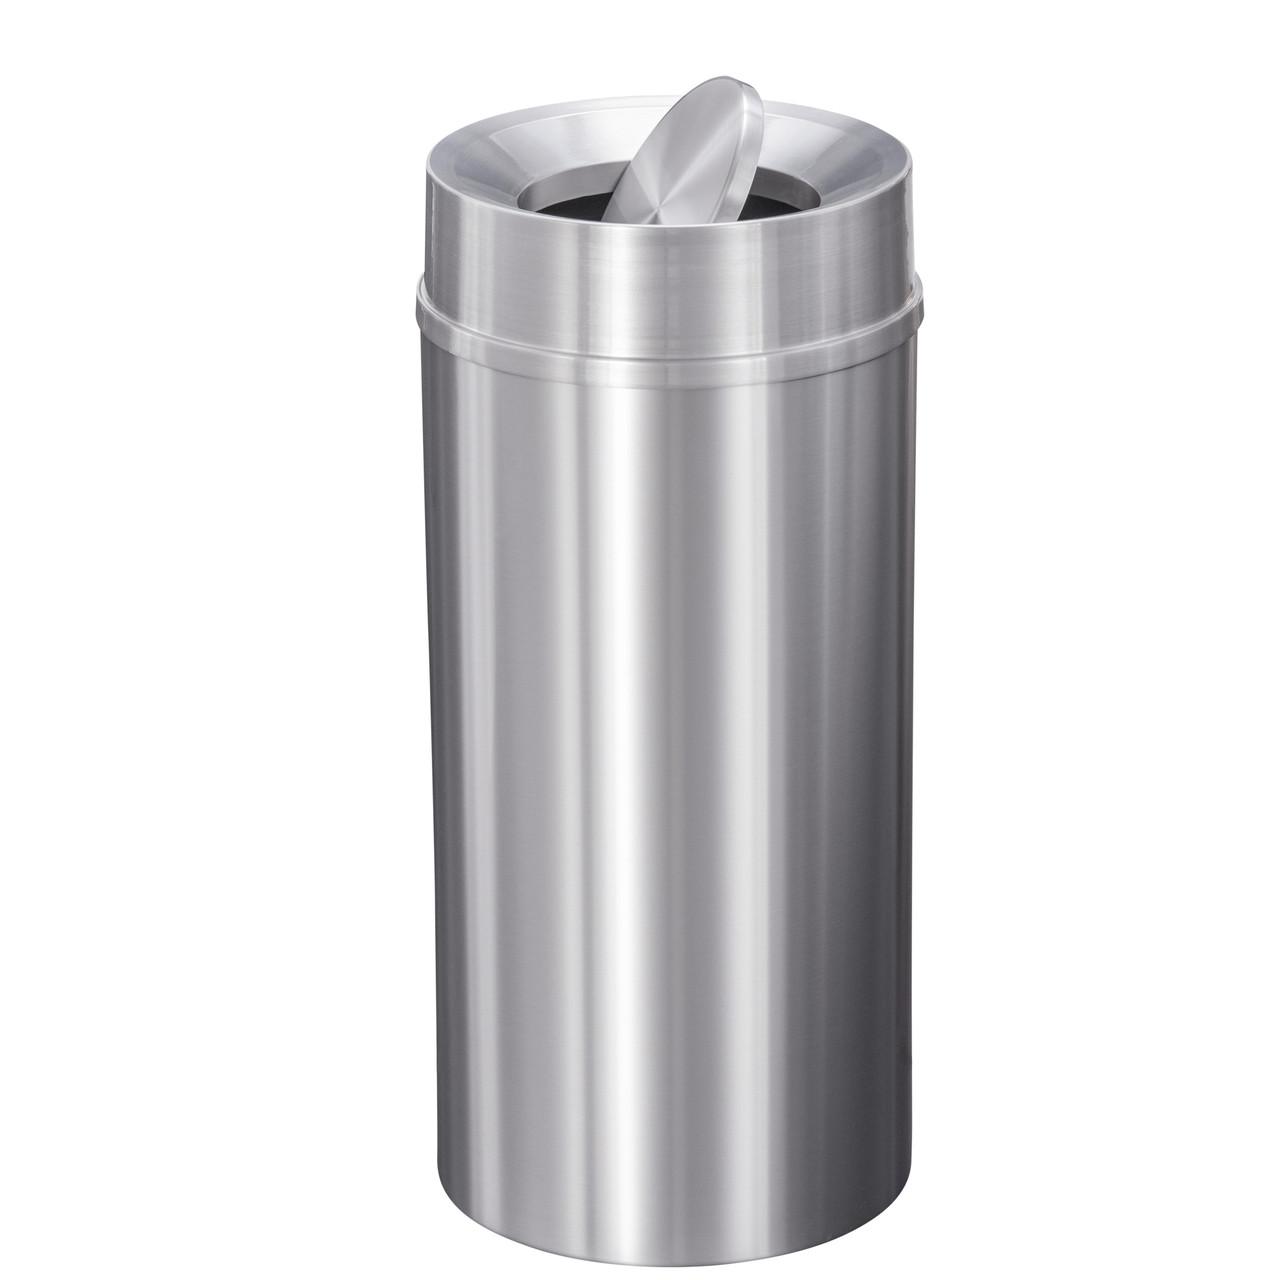 New Yorker 16 Gallon TA1533SA Tip Action Trash Receptacle w/Plastic Liner